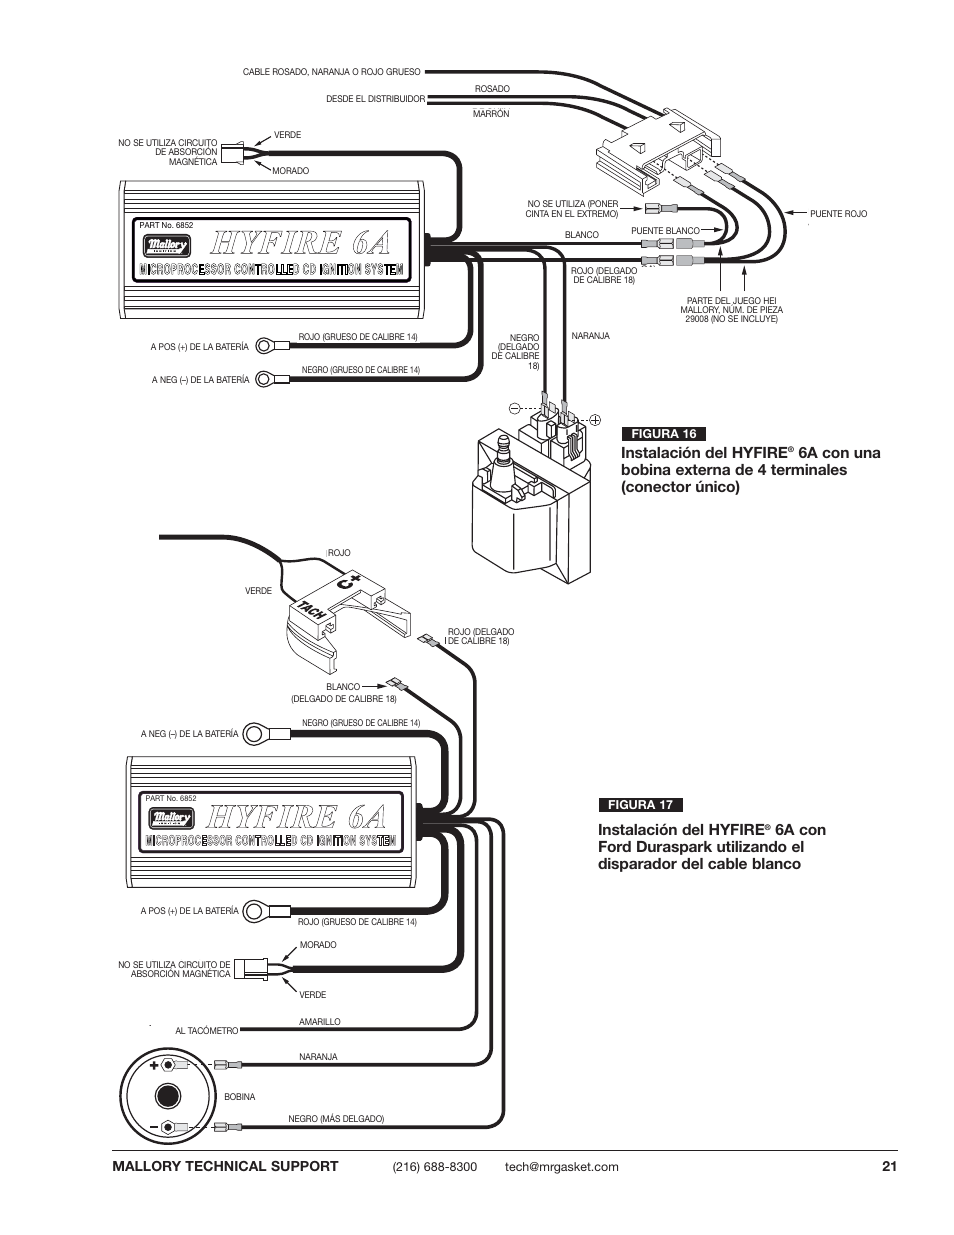 258C9 Mallory Hyfire Wiring Diagram | Digital Resources on mallory battery, mallory resistors, mallory furniture, mallory gauges, mallory electronics,